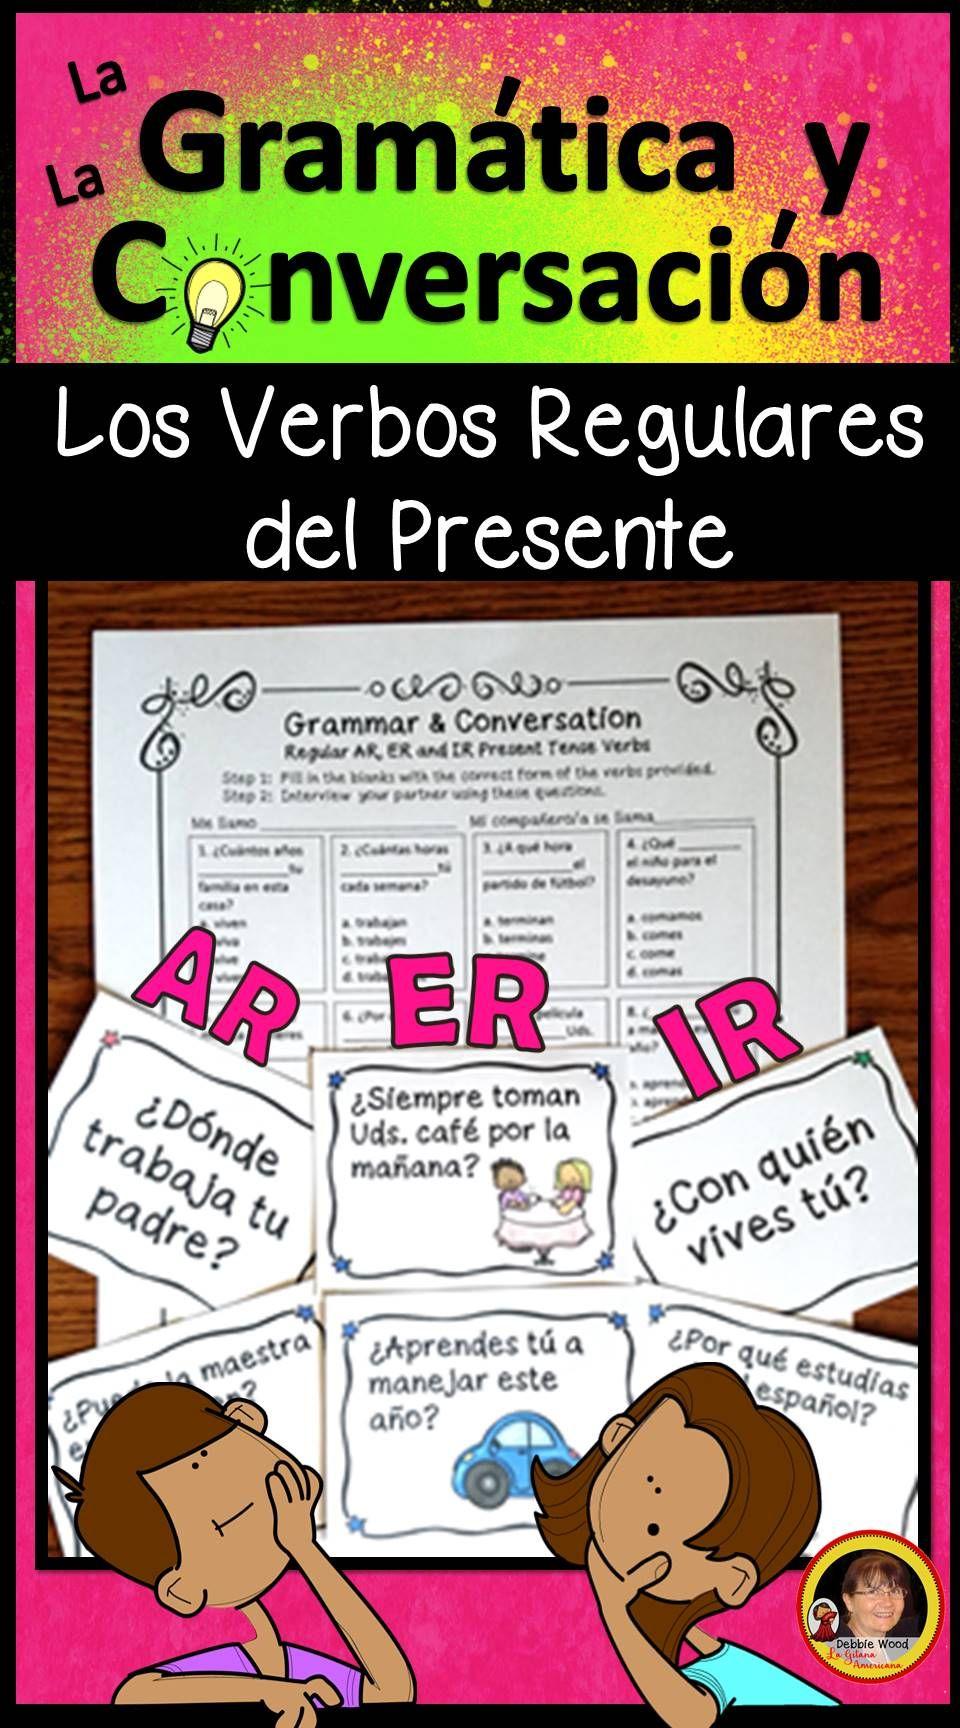 Spanish Present Tense Verbs Spanish Grammar And Conversation Present Tense Verbs Spanish Grammar How To Speak Spanish [ 1728 x 960 Pixel ]